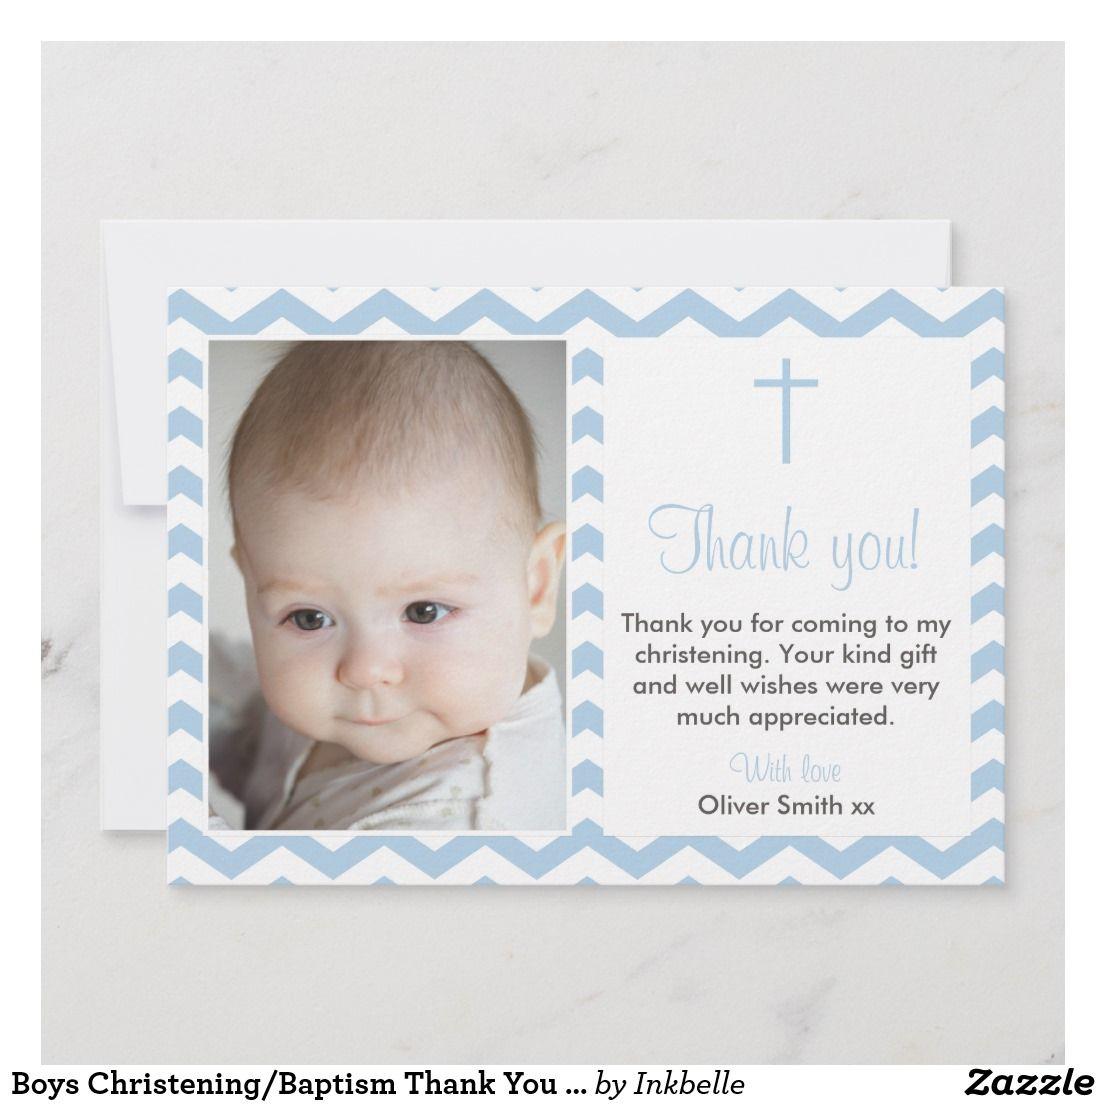 Boys Christening Baptism Thank You Card Zazzle Com Baptism Thank You Cards Thank You Card Wording Thank You Cards